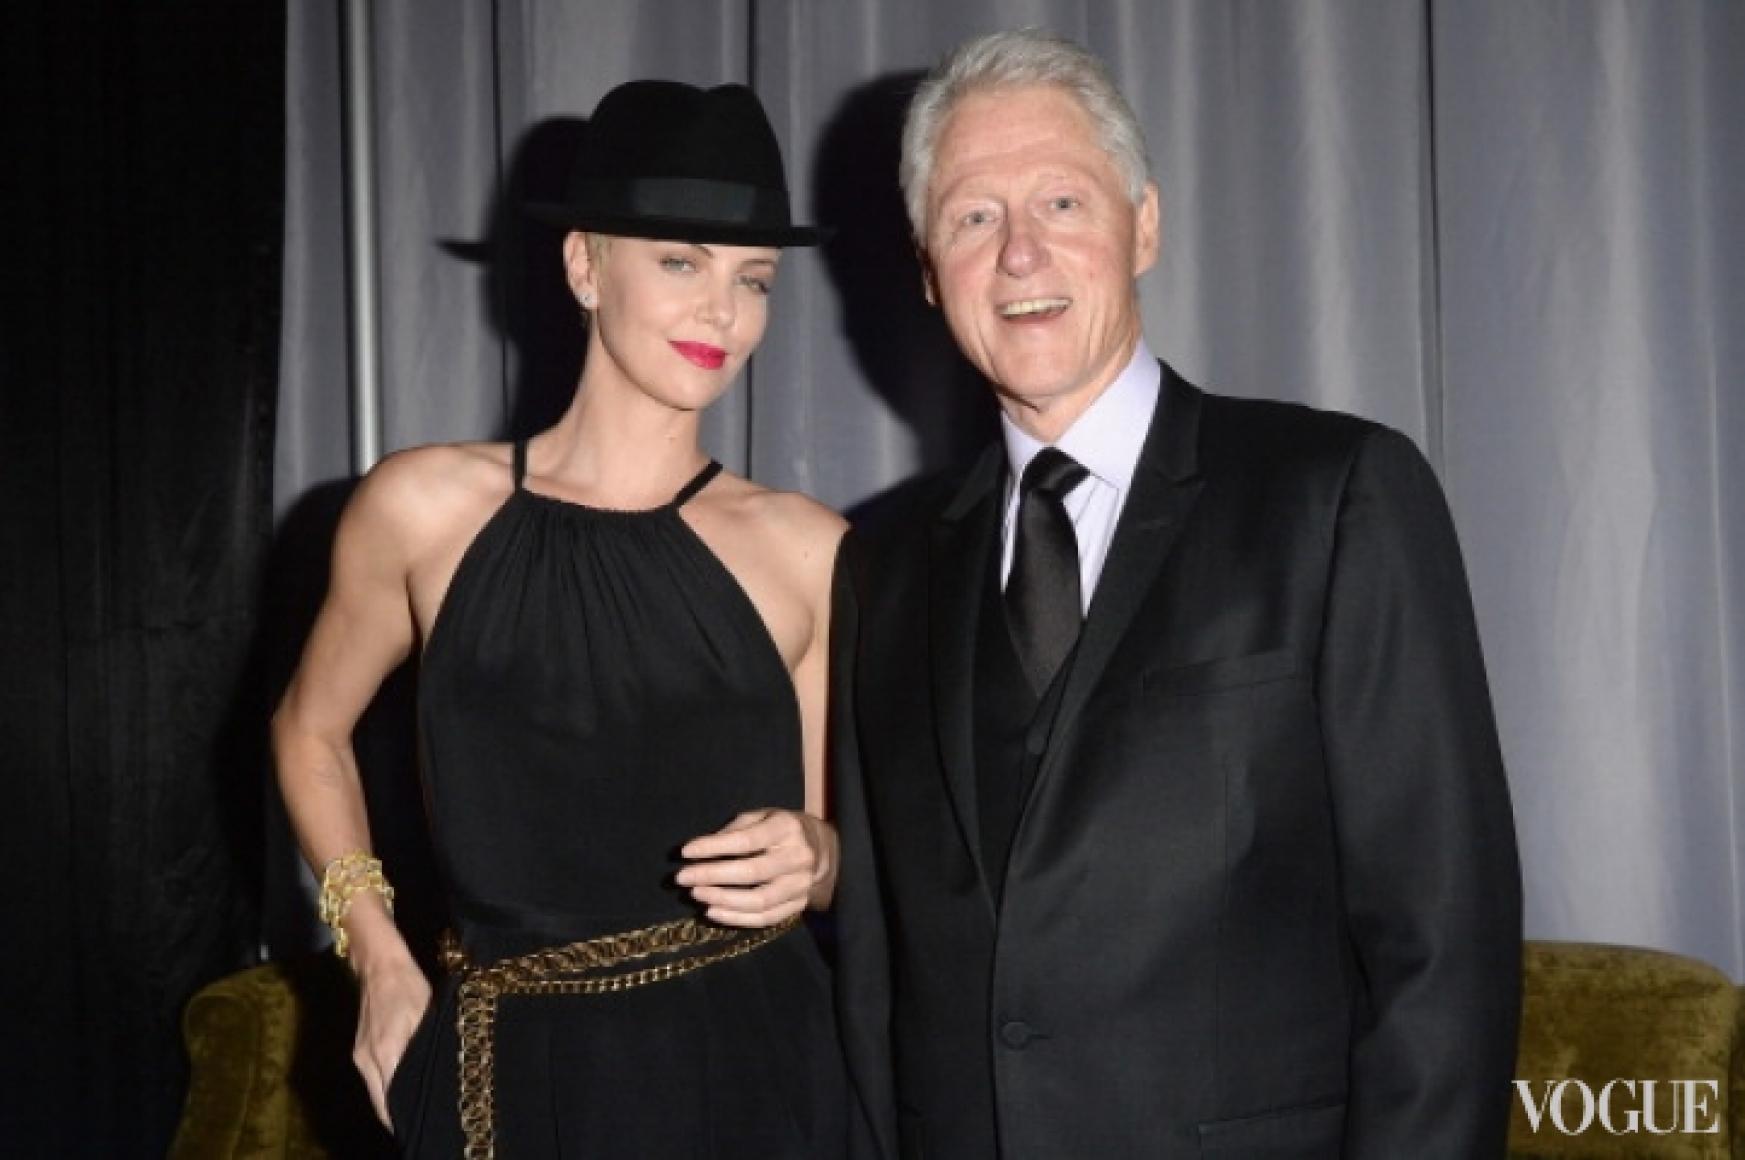 Шарлиз Терон и Билл Клинтон